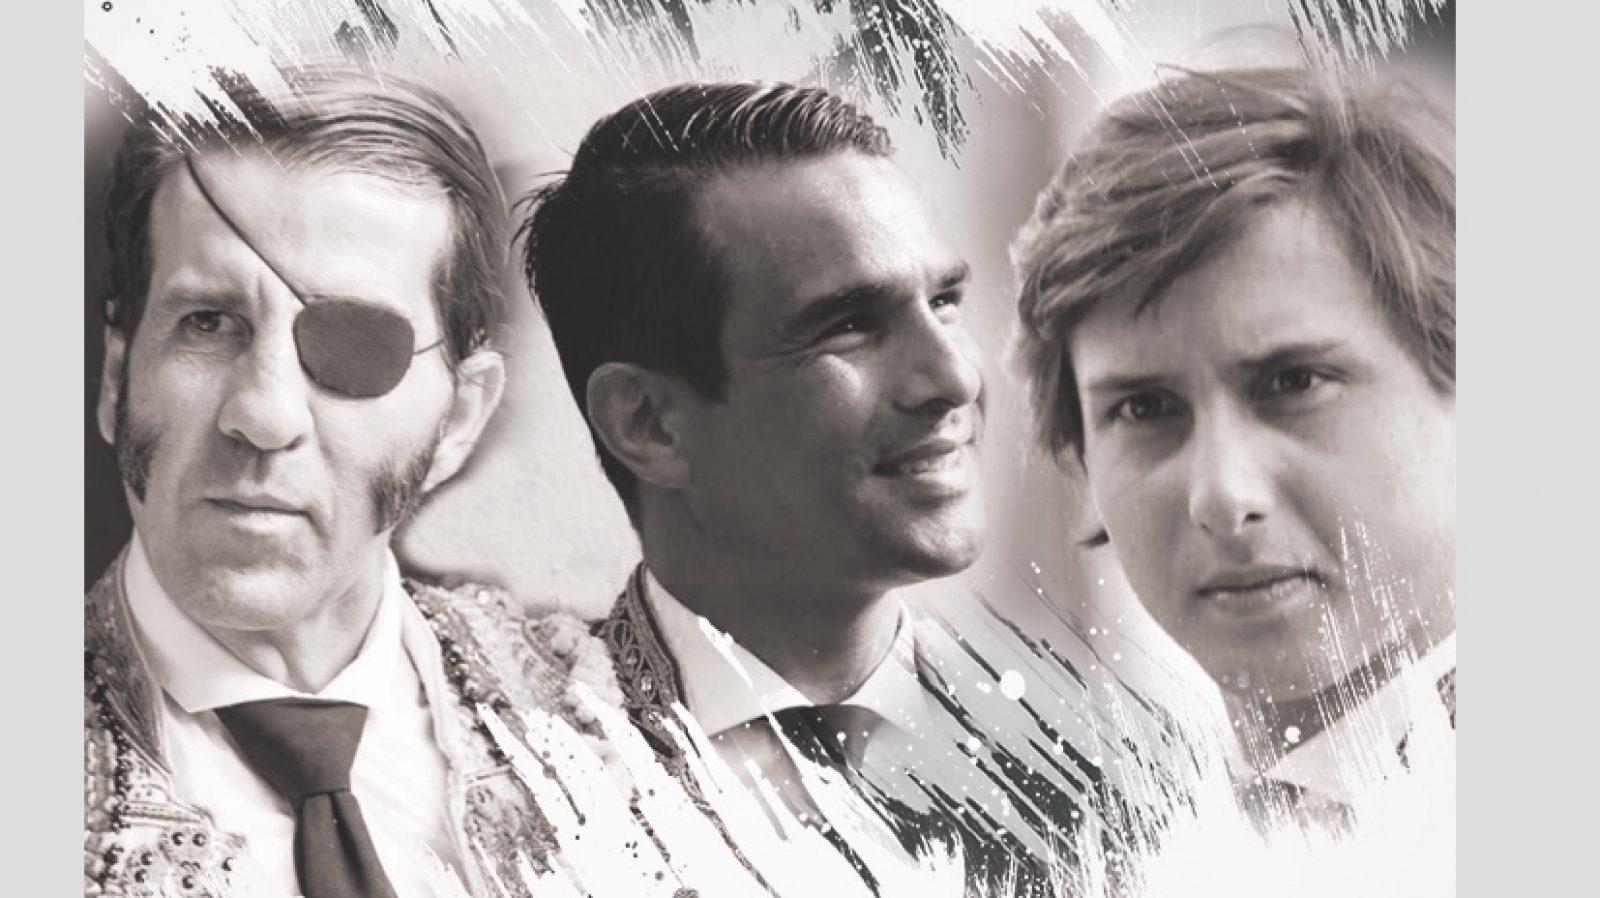 DIRECT LIVE TORO // FERIA NÎMES PENTECÔTE 2018 – CORRIDA soir (20/05/2018) – Toros de Nuñez del Cuvillo pour Juan José Padilla, José Maria Manzanares et Andres Roca Rey